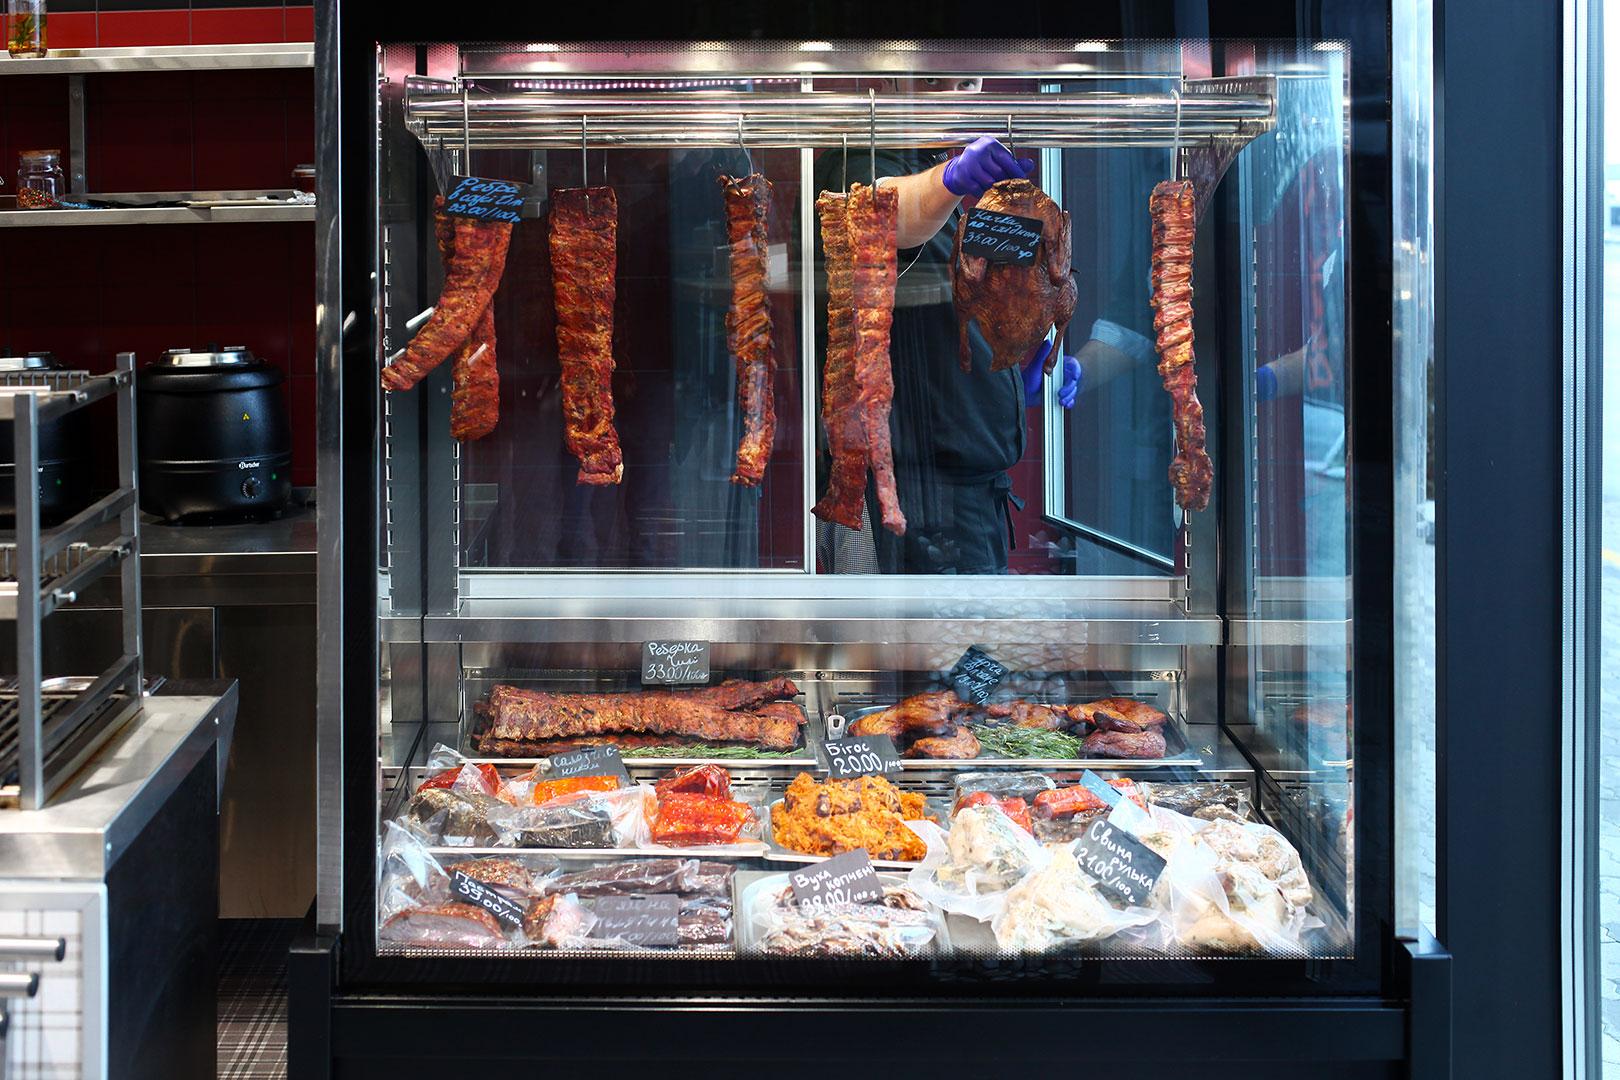 Specialized units for meat sales Missouri MC 120 crystal S 203-DLA